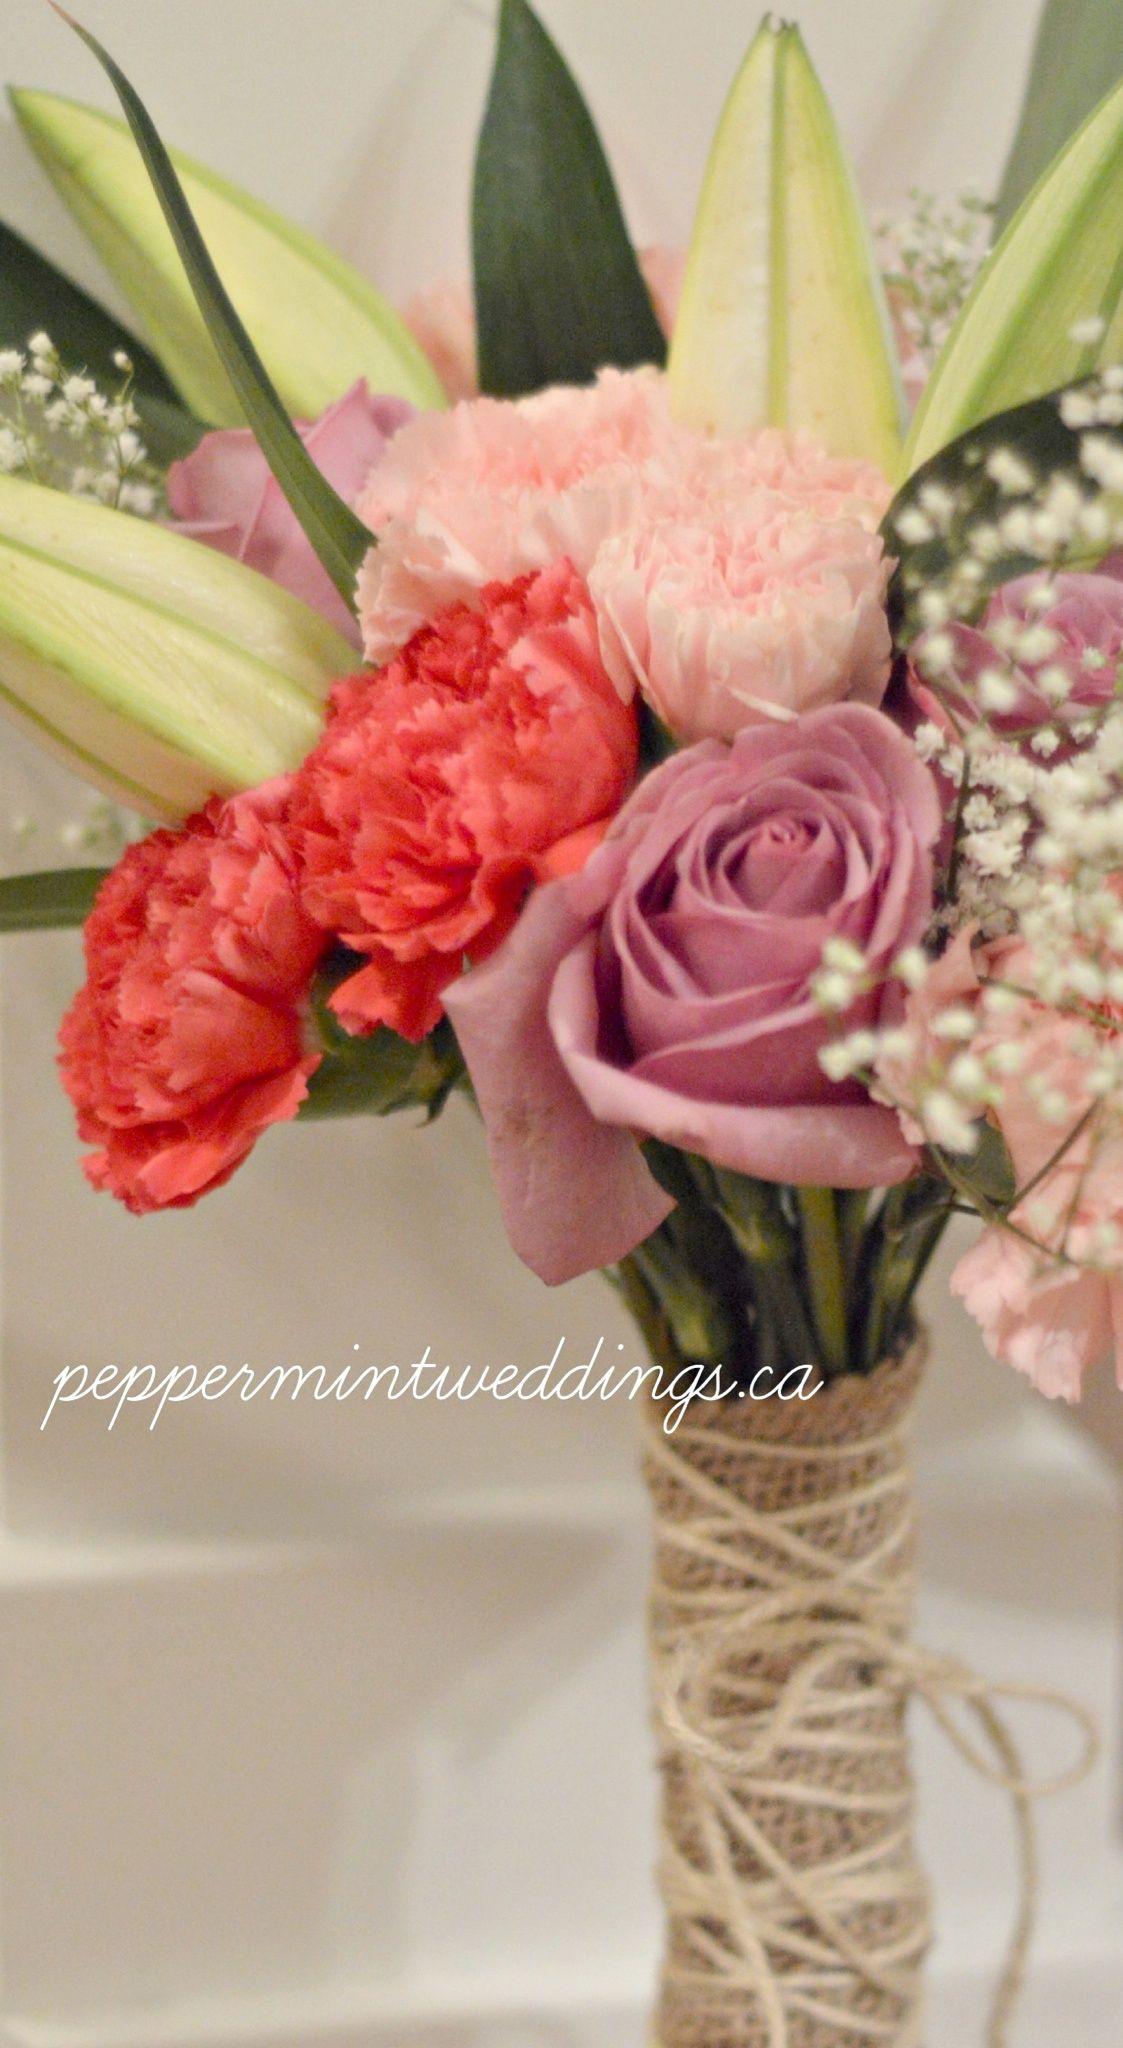 Rustic mix carnations lilies roses babys breath gypsophila rustic mix carnations lilies roses babys breath gypsophila wedding bouquet toronto weddings toronto wedding floral peppermint weddings izmirmasajfo